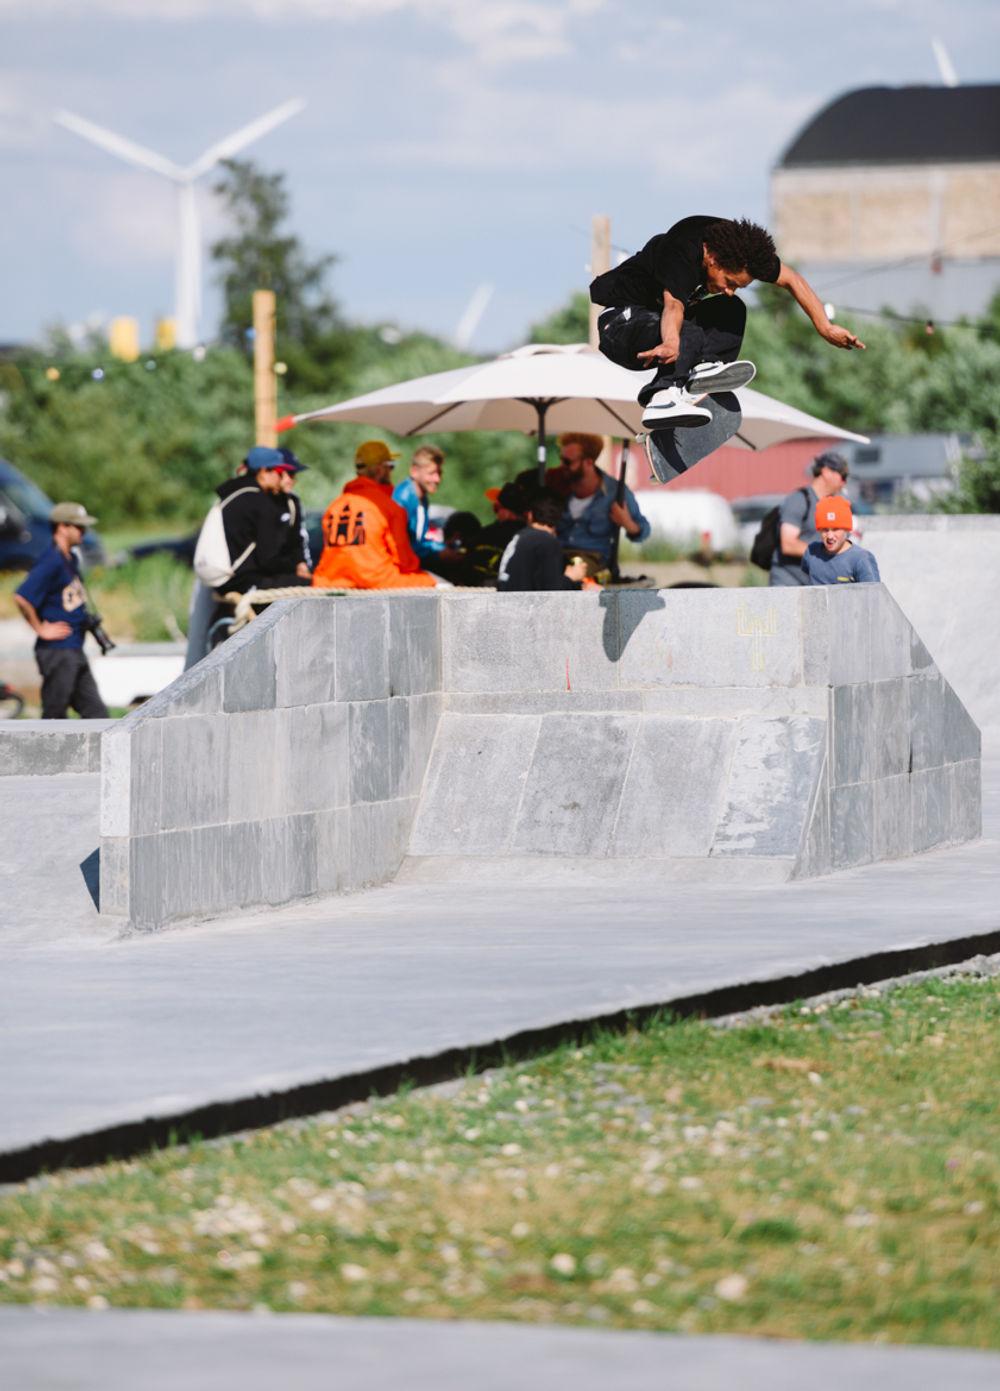 _IHC5742e-Kevin-Bradley-Kickflip-Nike-SB-Copenhagen-Open-Day-4-July-2015-Photographer-Maksim-Kalanep